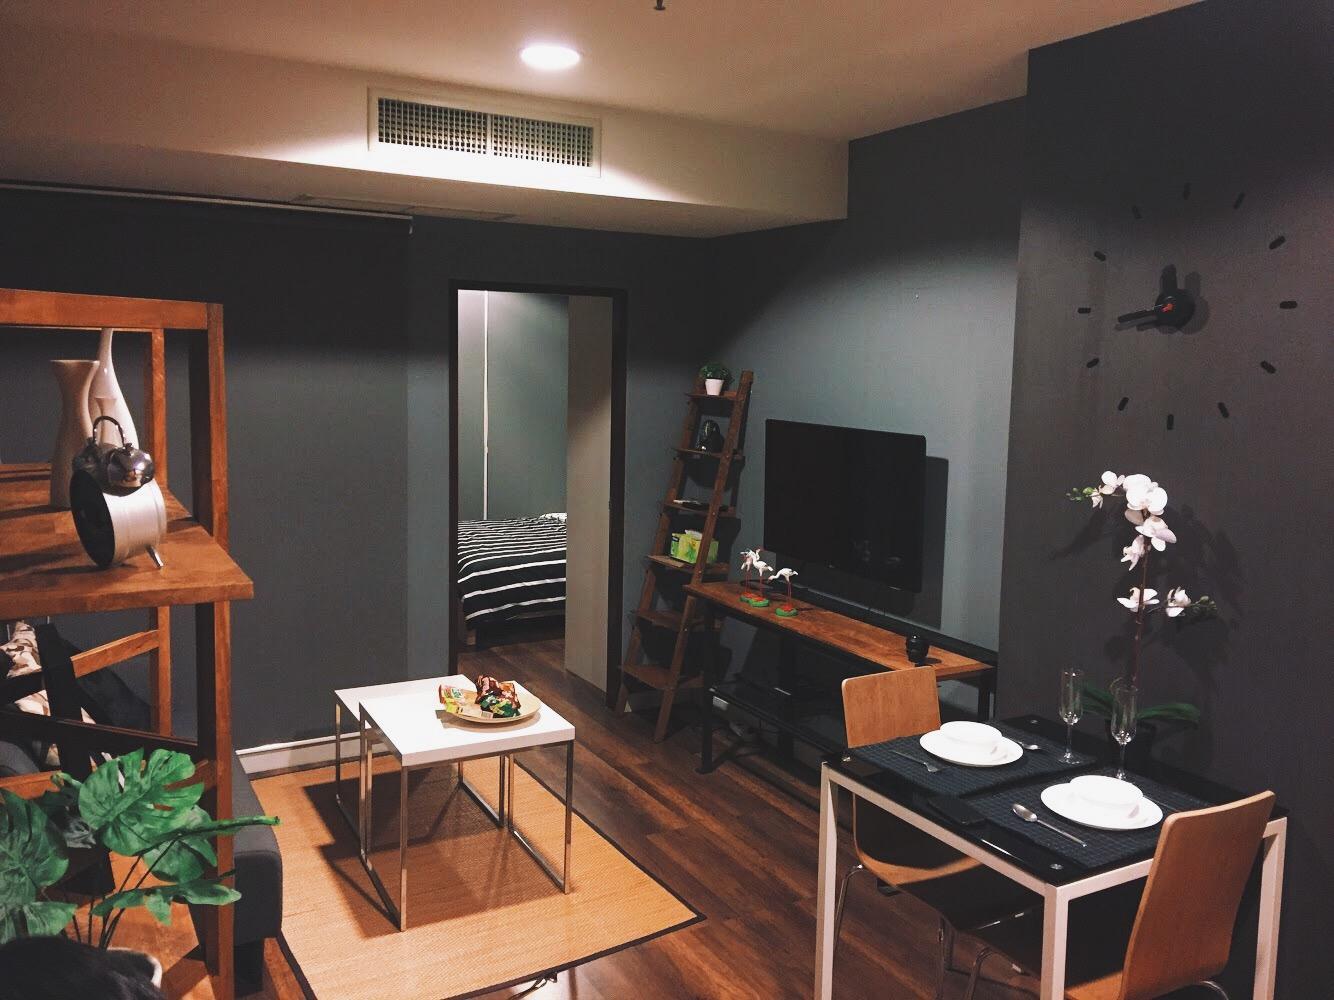 Luxury apartment|City View|BTS Thonglo Luxury apartment|City View|BTS Thonglo